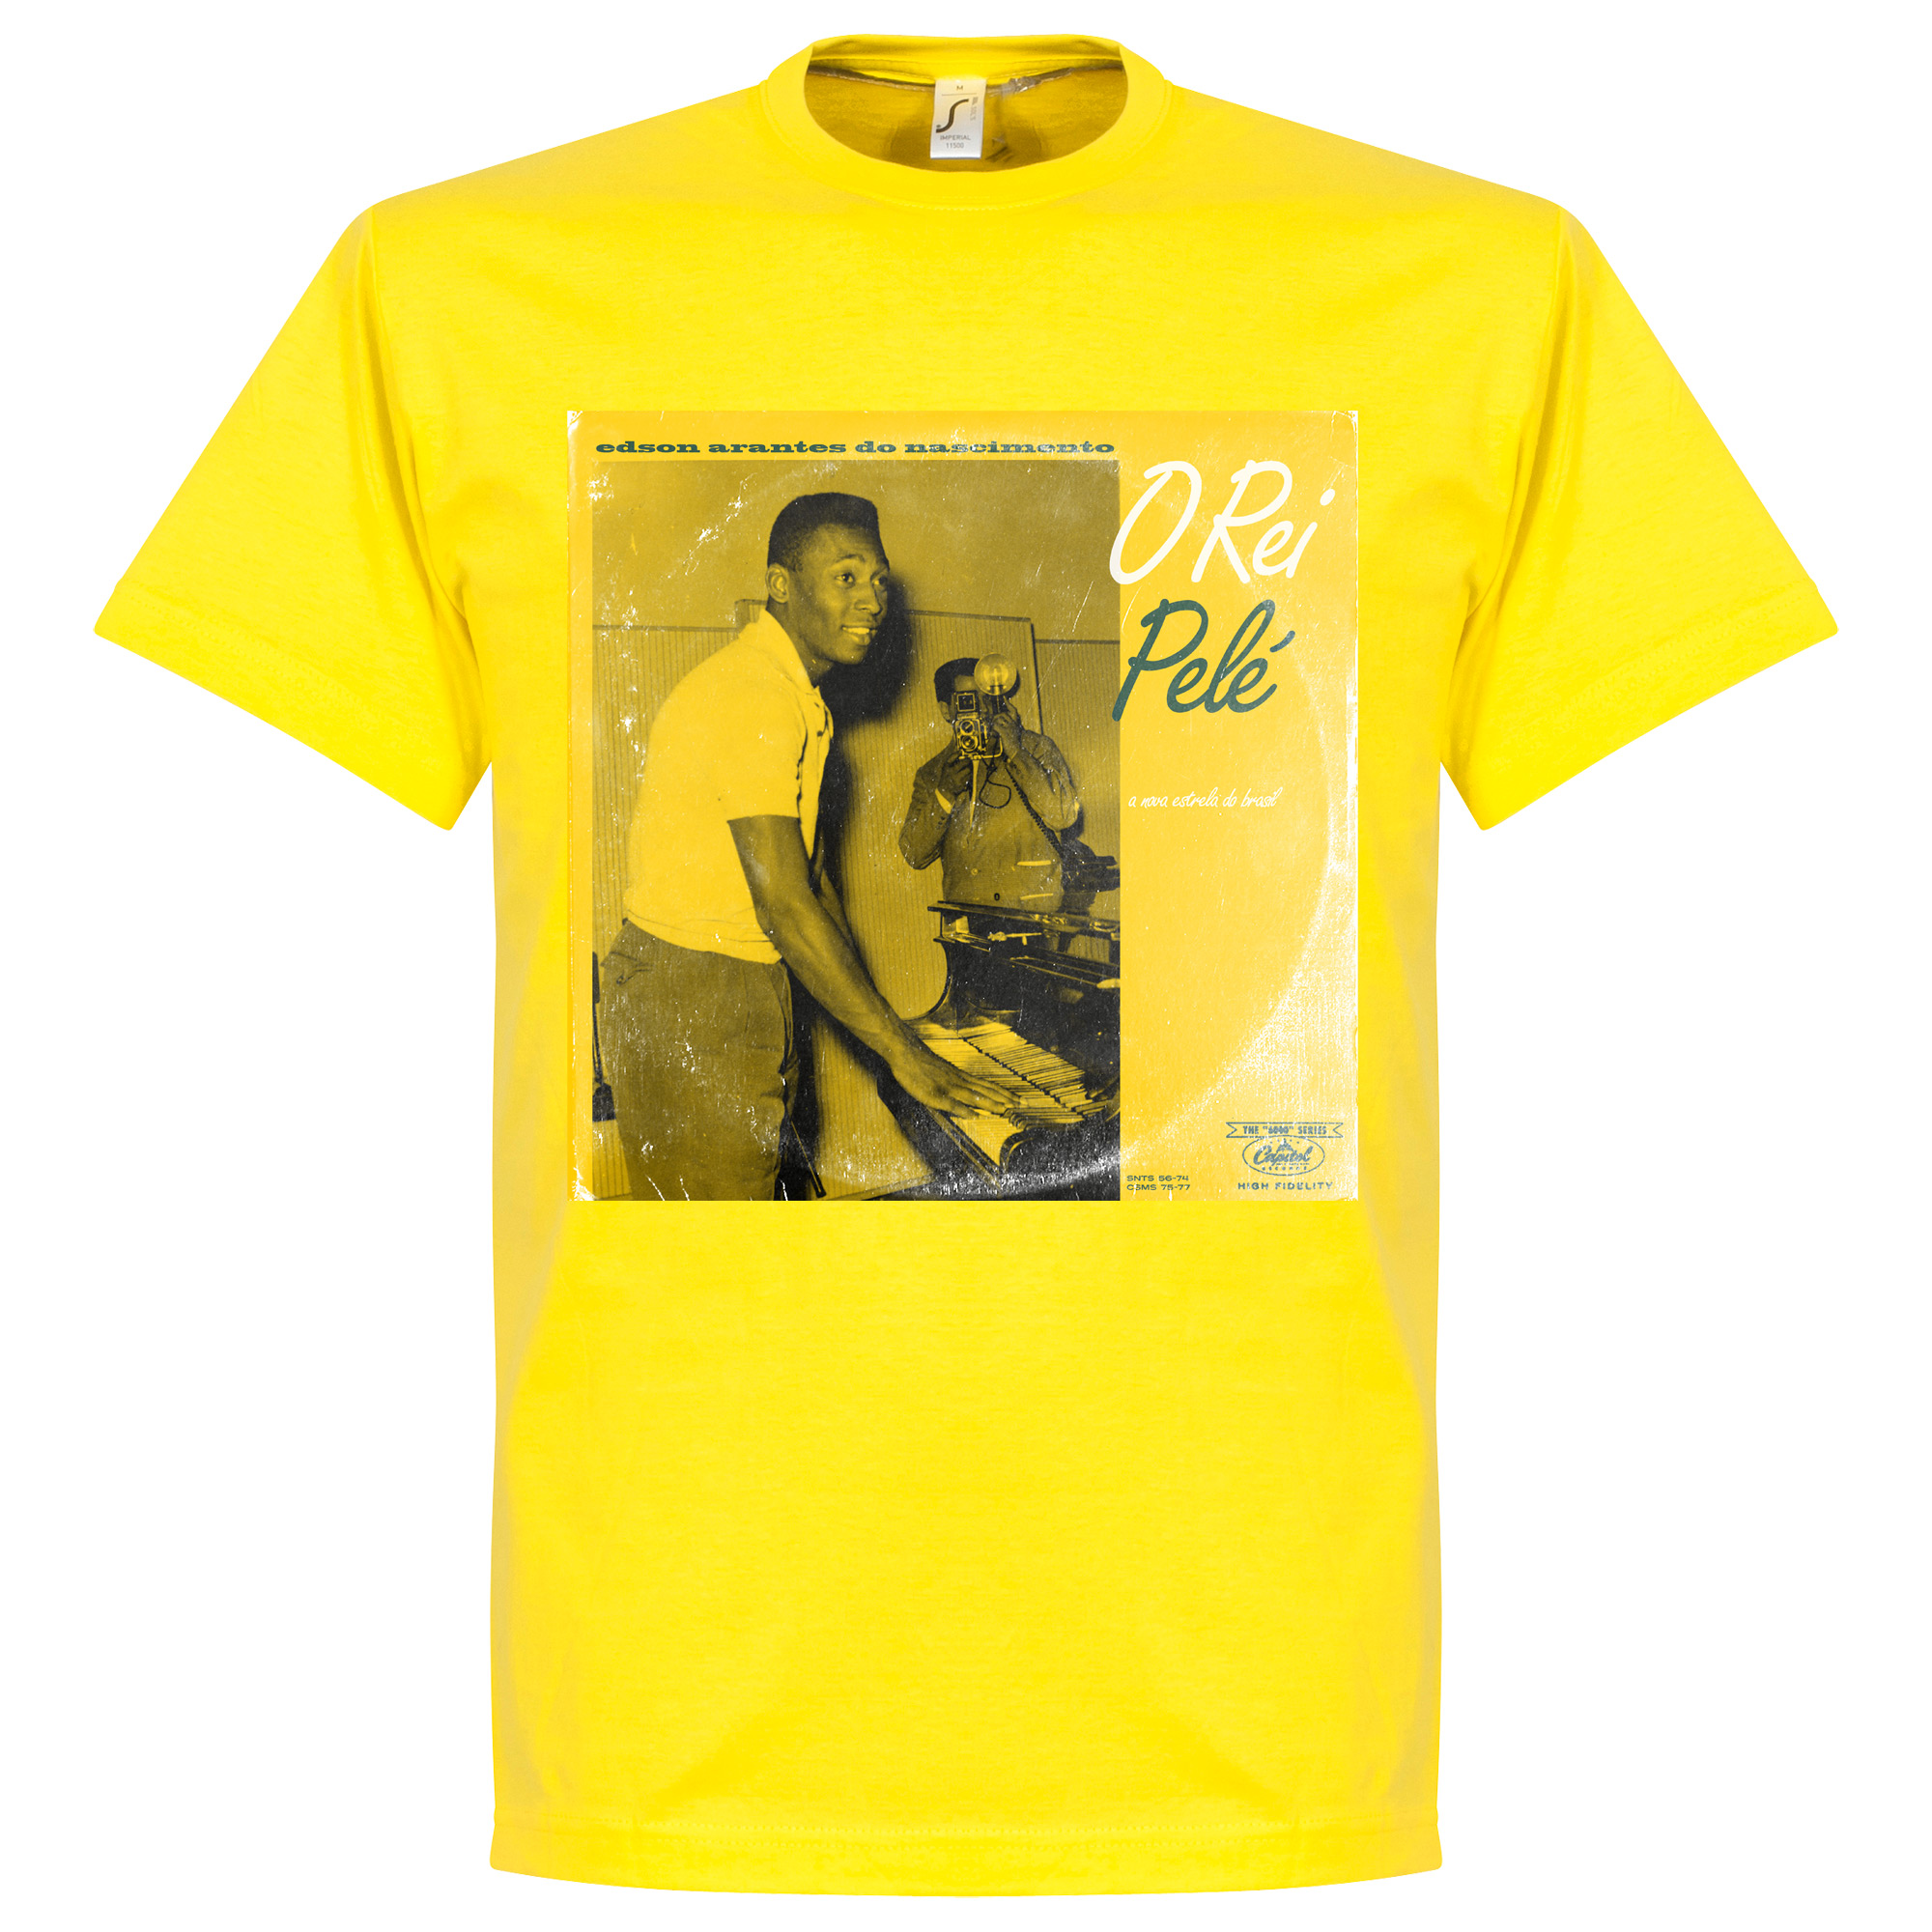 Pennarello LPFC Pelé T-Shirt